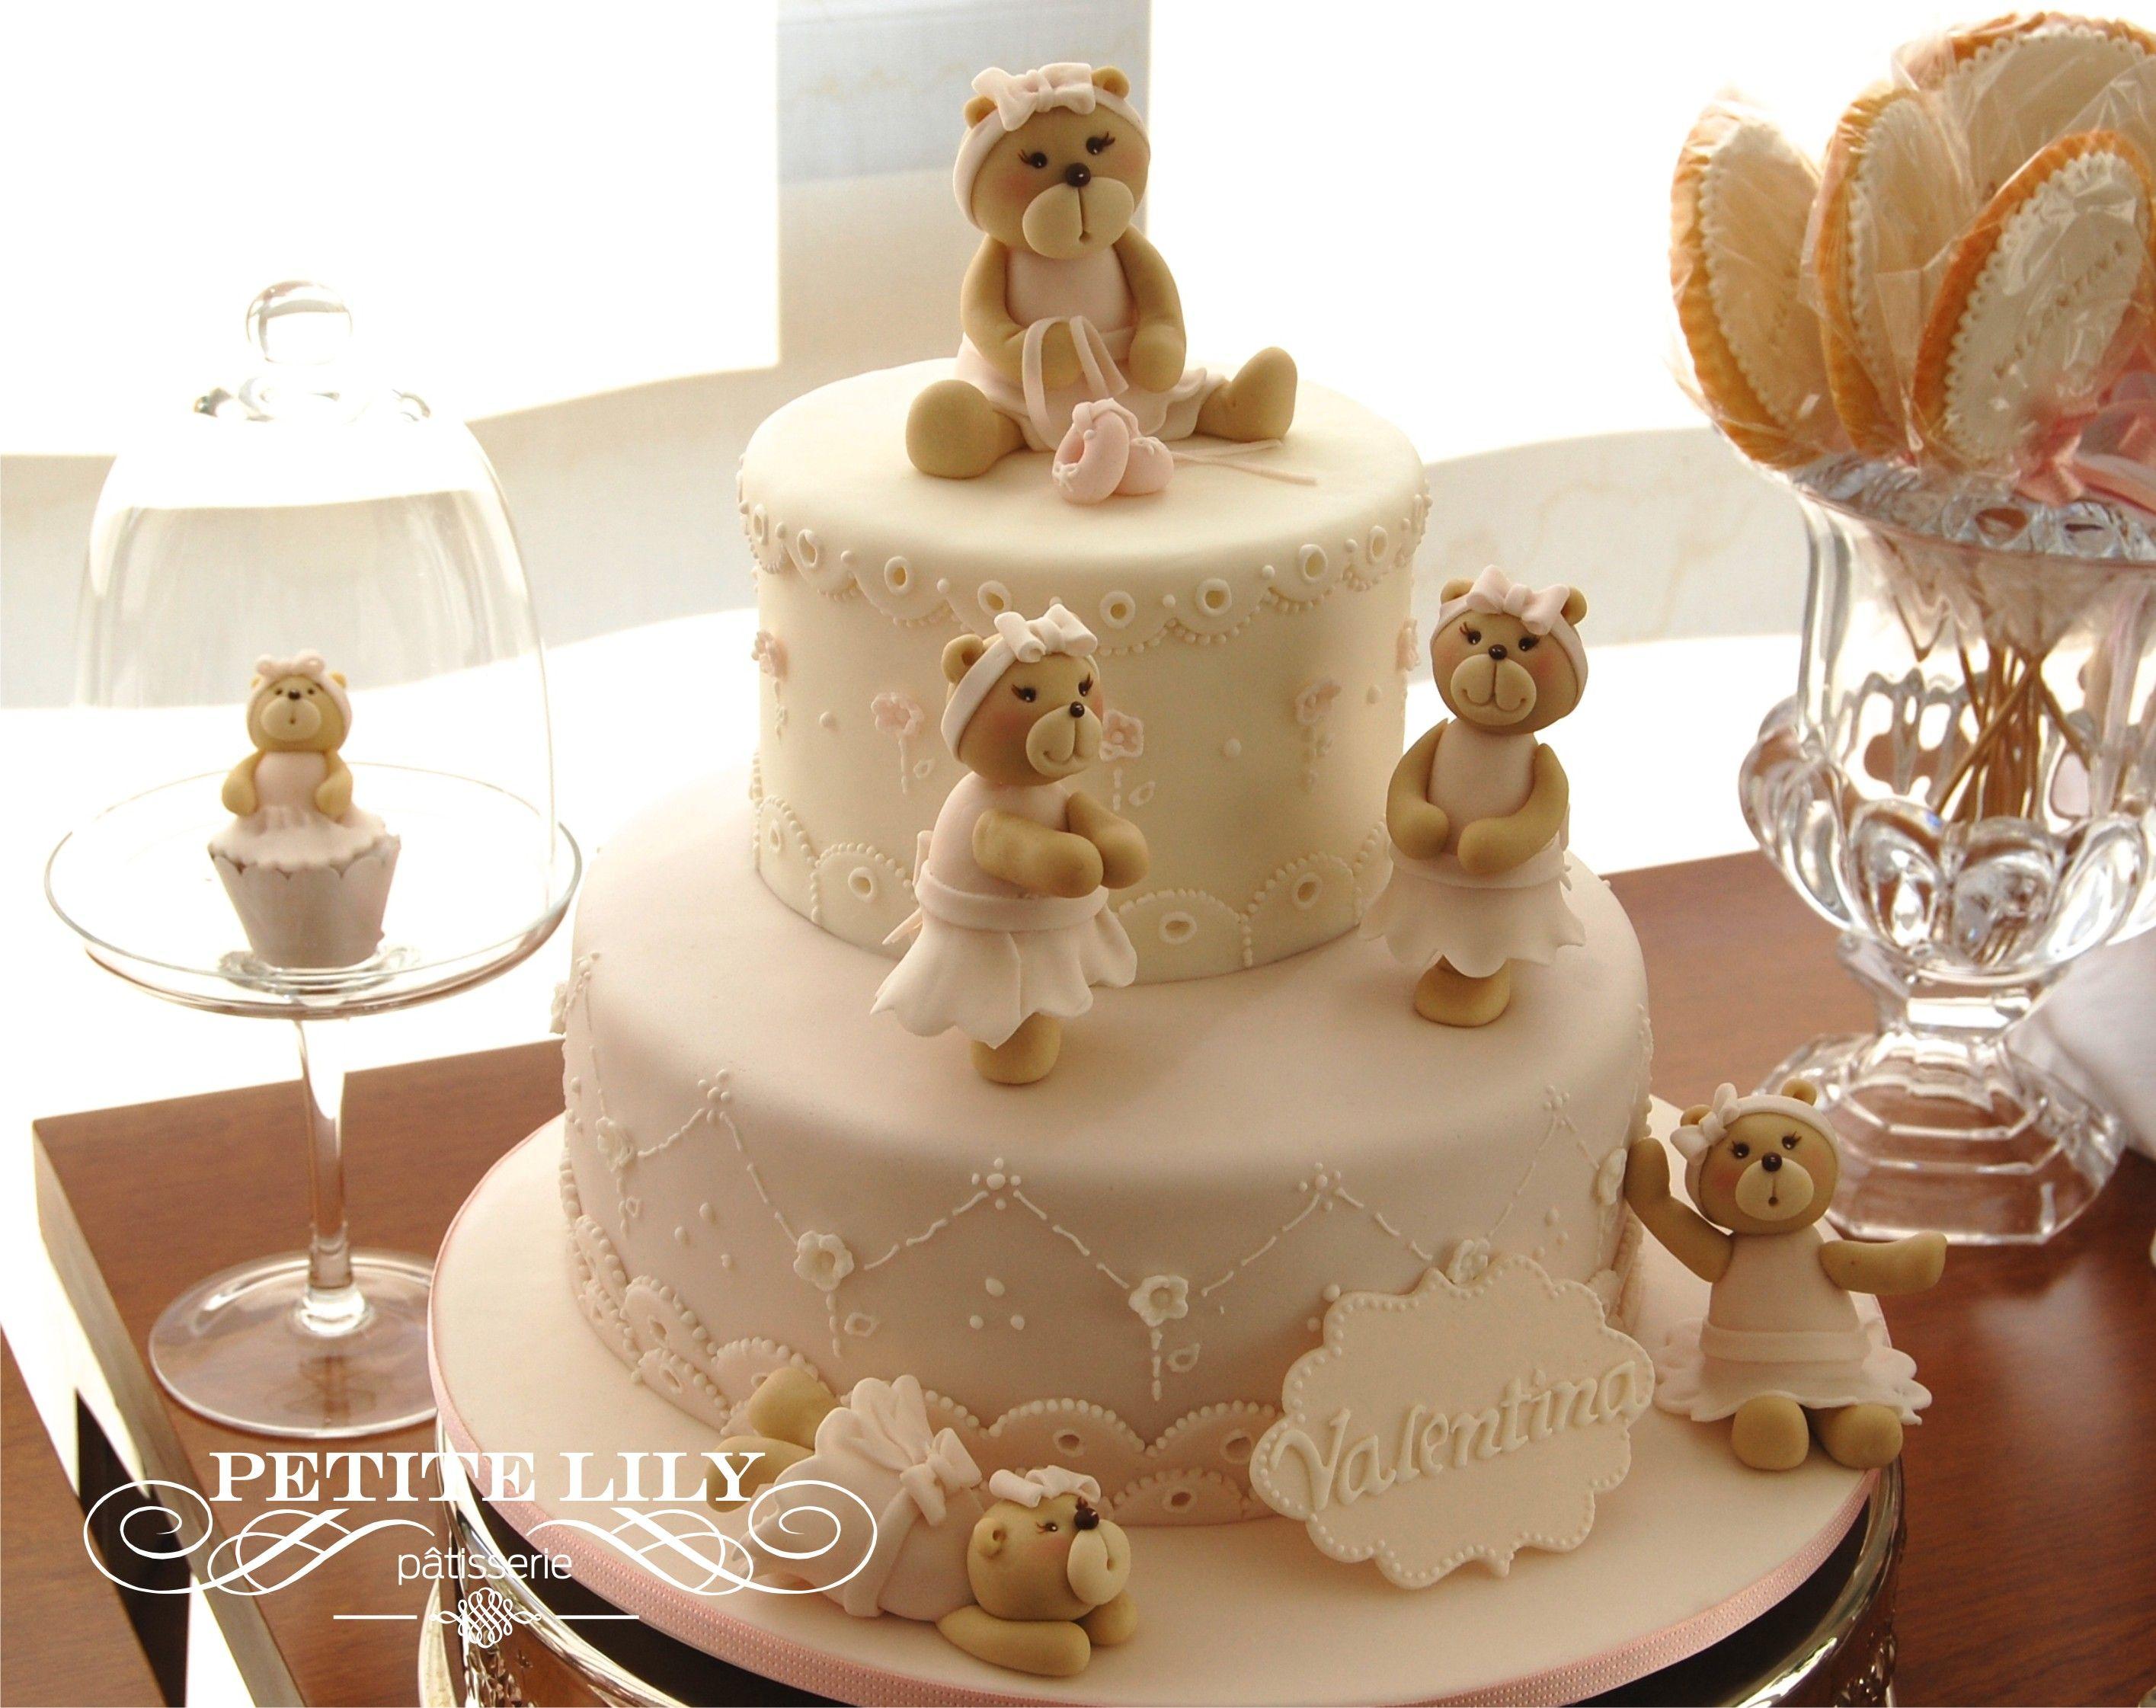 Ballerina Teddy Bear Cake For A Delicate Baby Shower